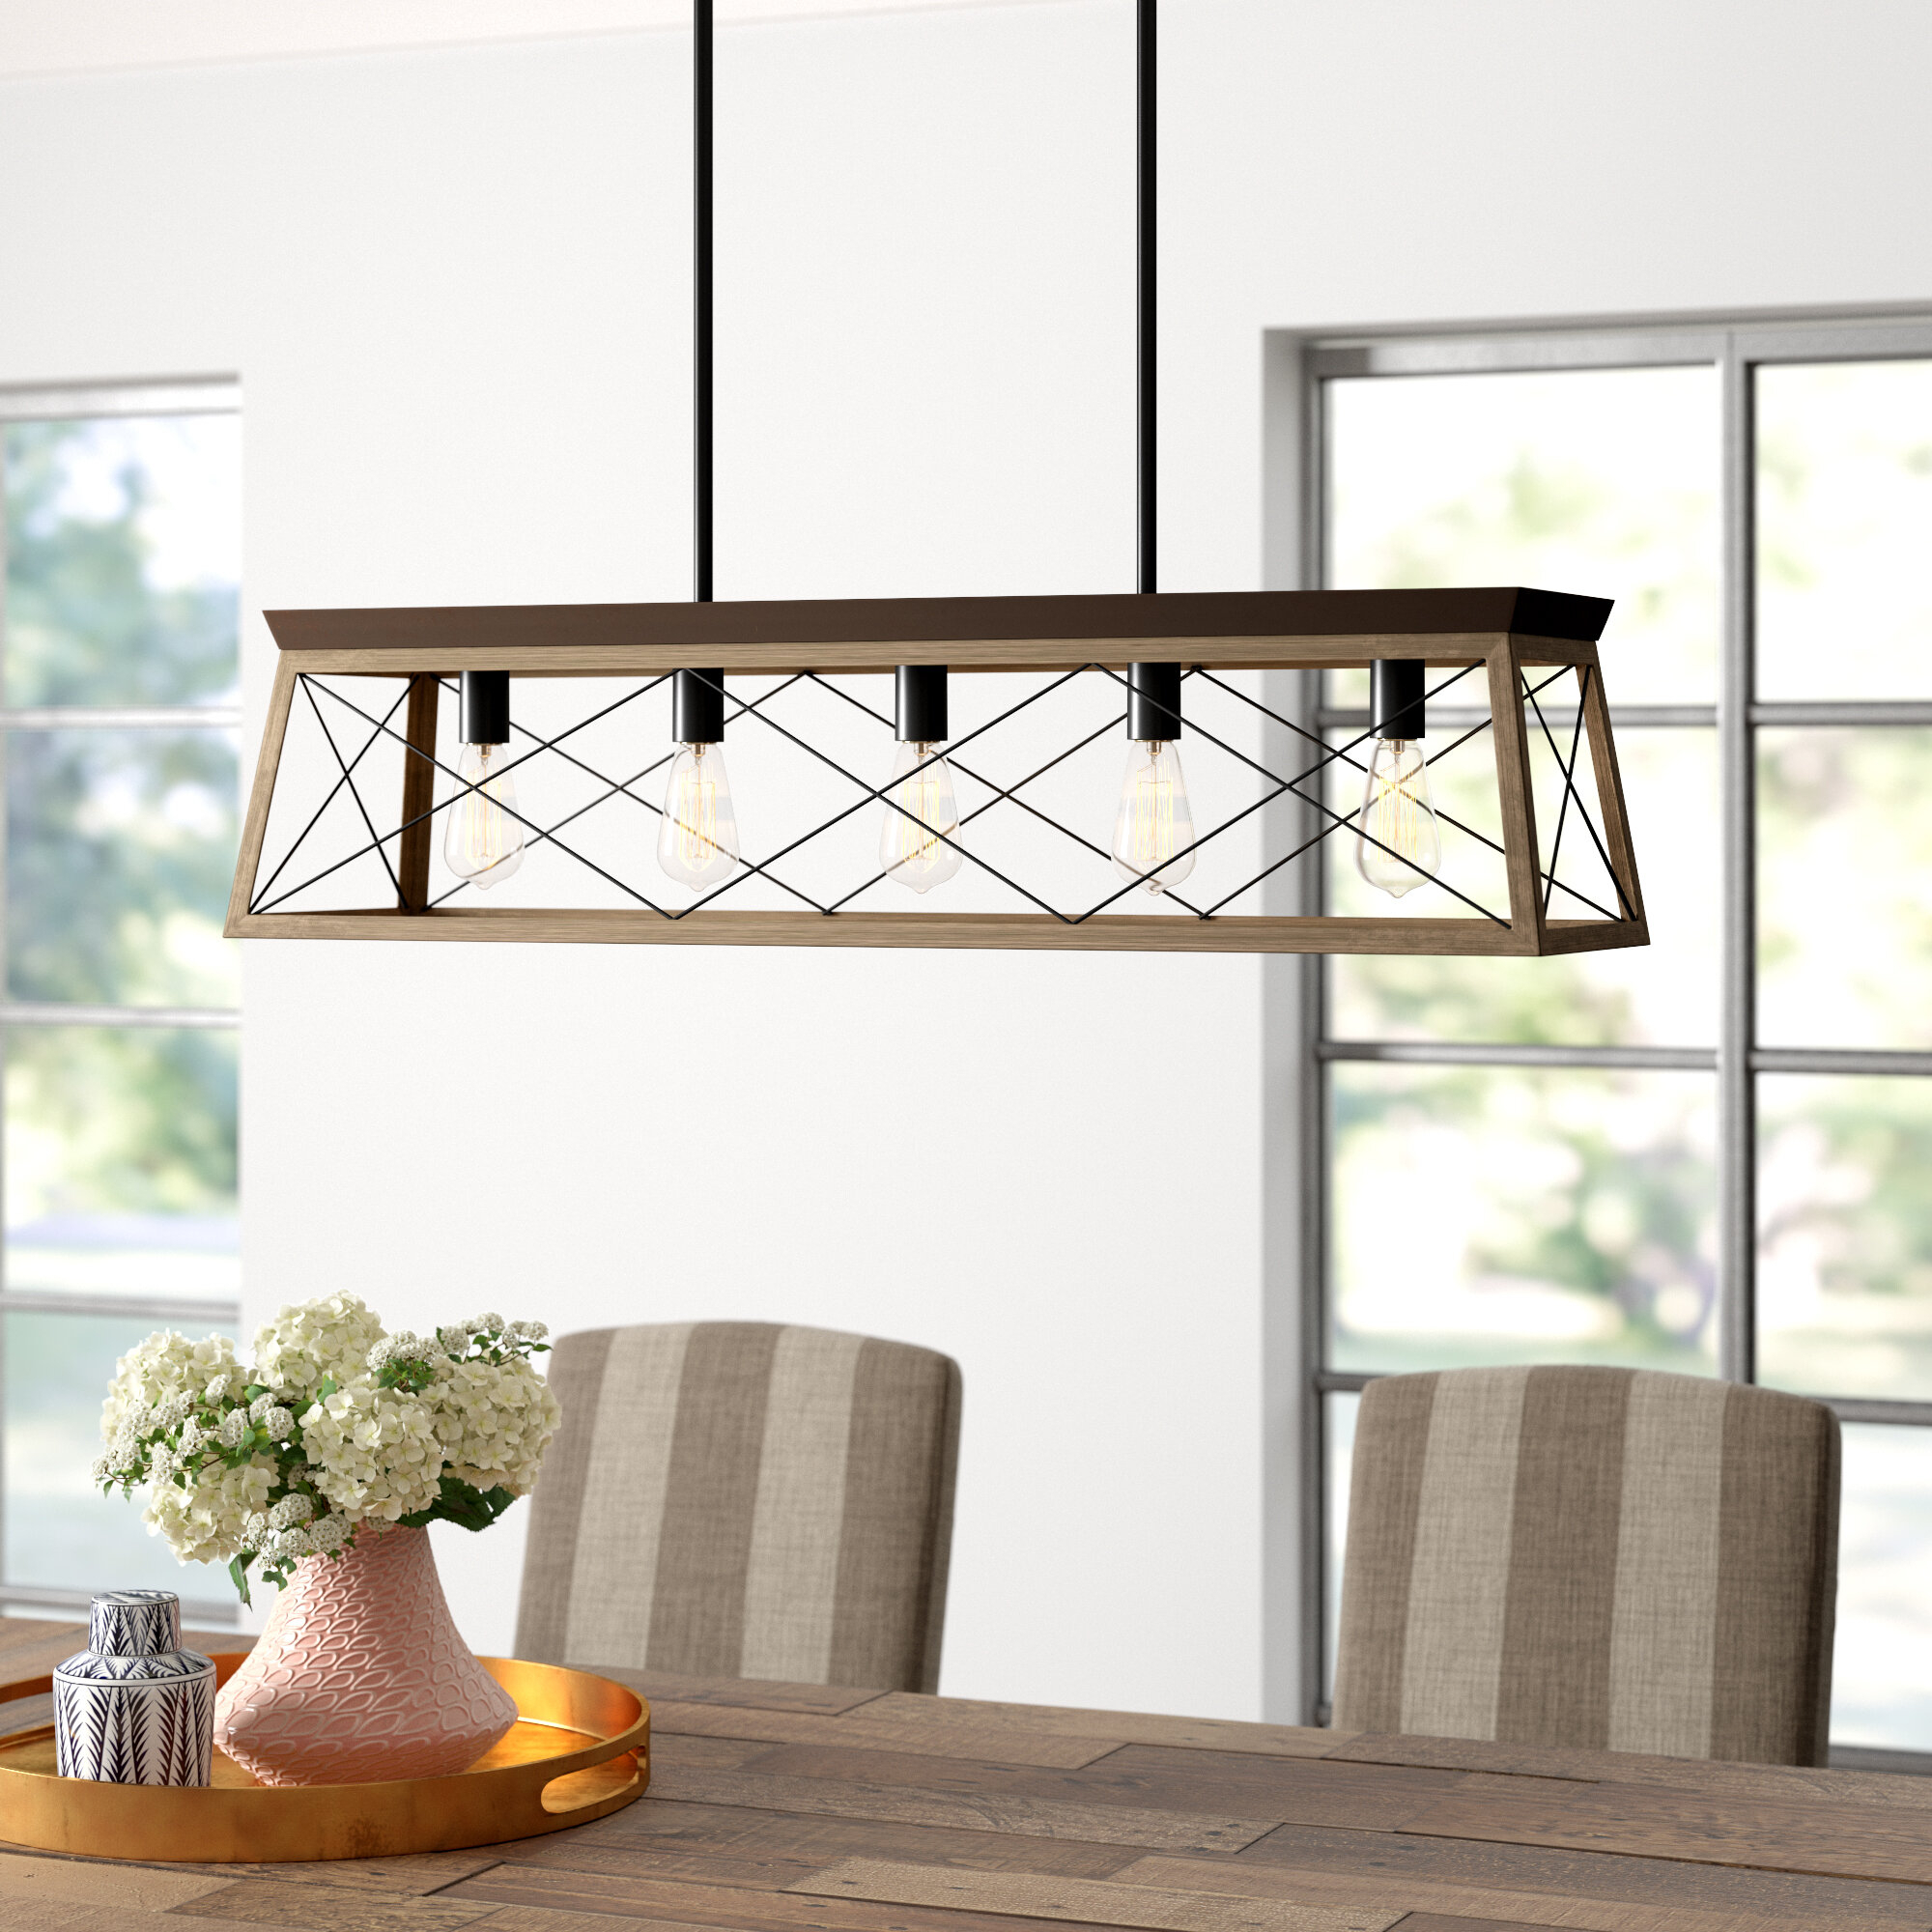 Delon 5 Light Kitchen Island Linear Pendant & Reviews | Joss With Delon 1 Light Lantern Geometric Pendants (View 8 of 30)